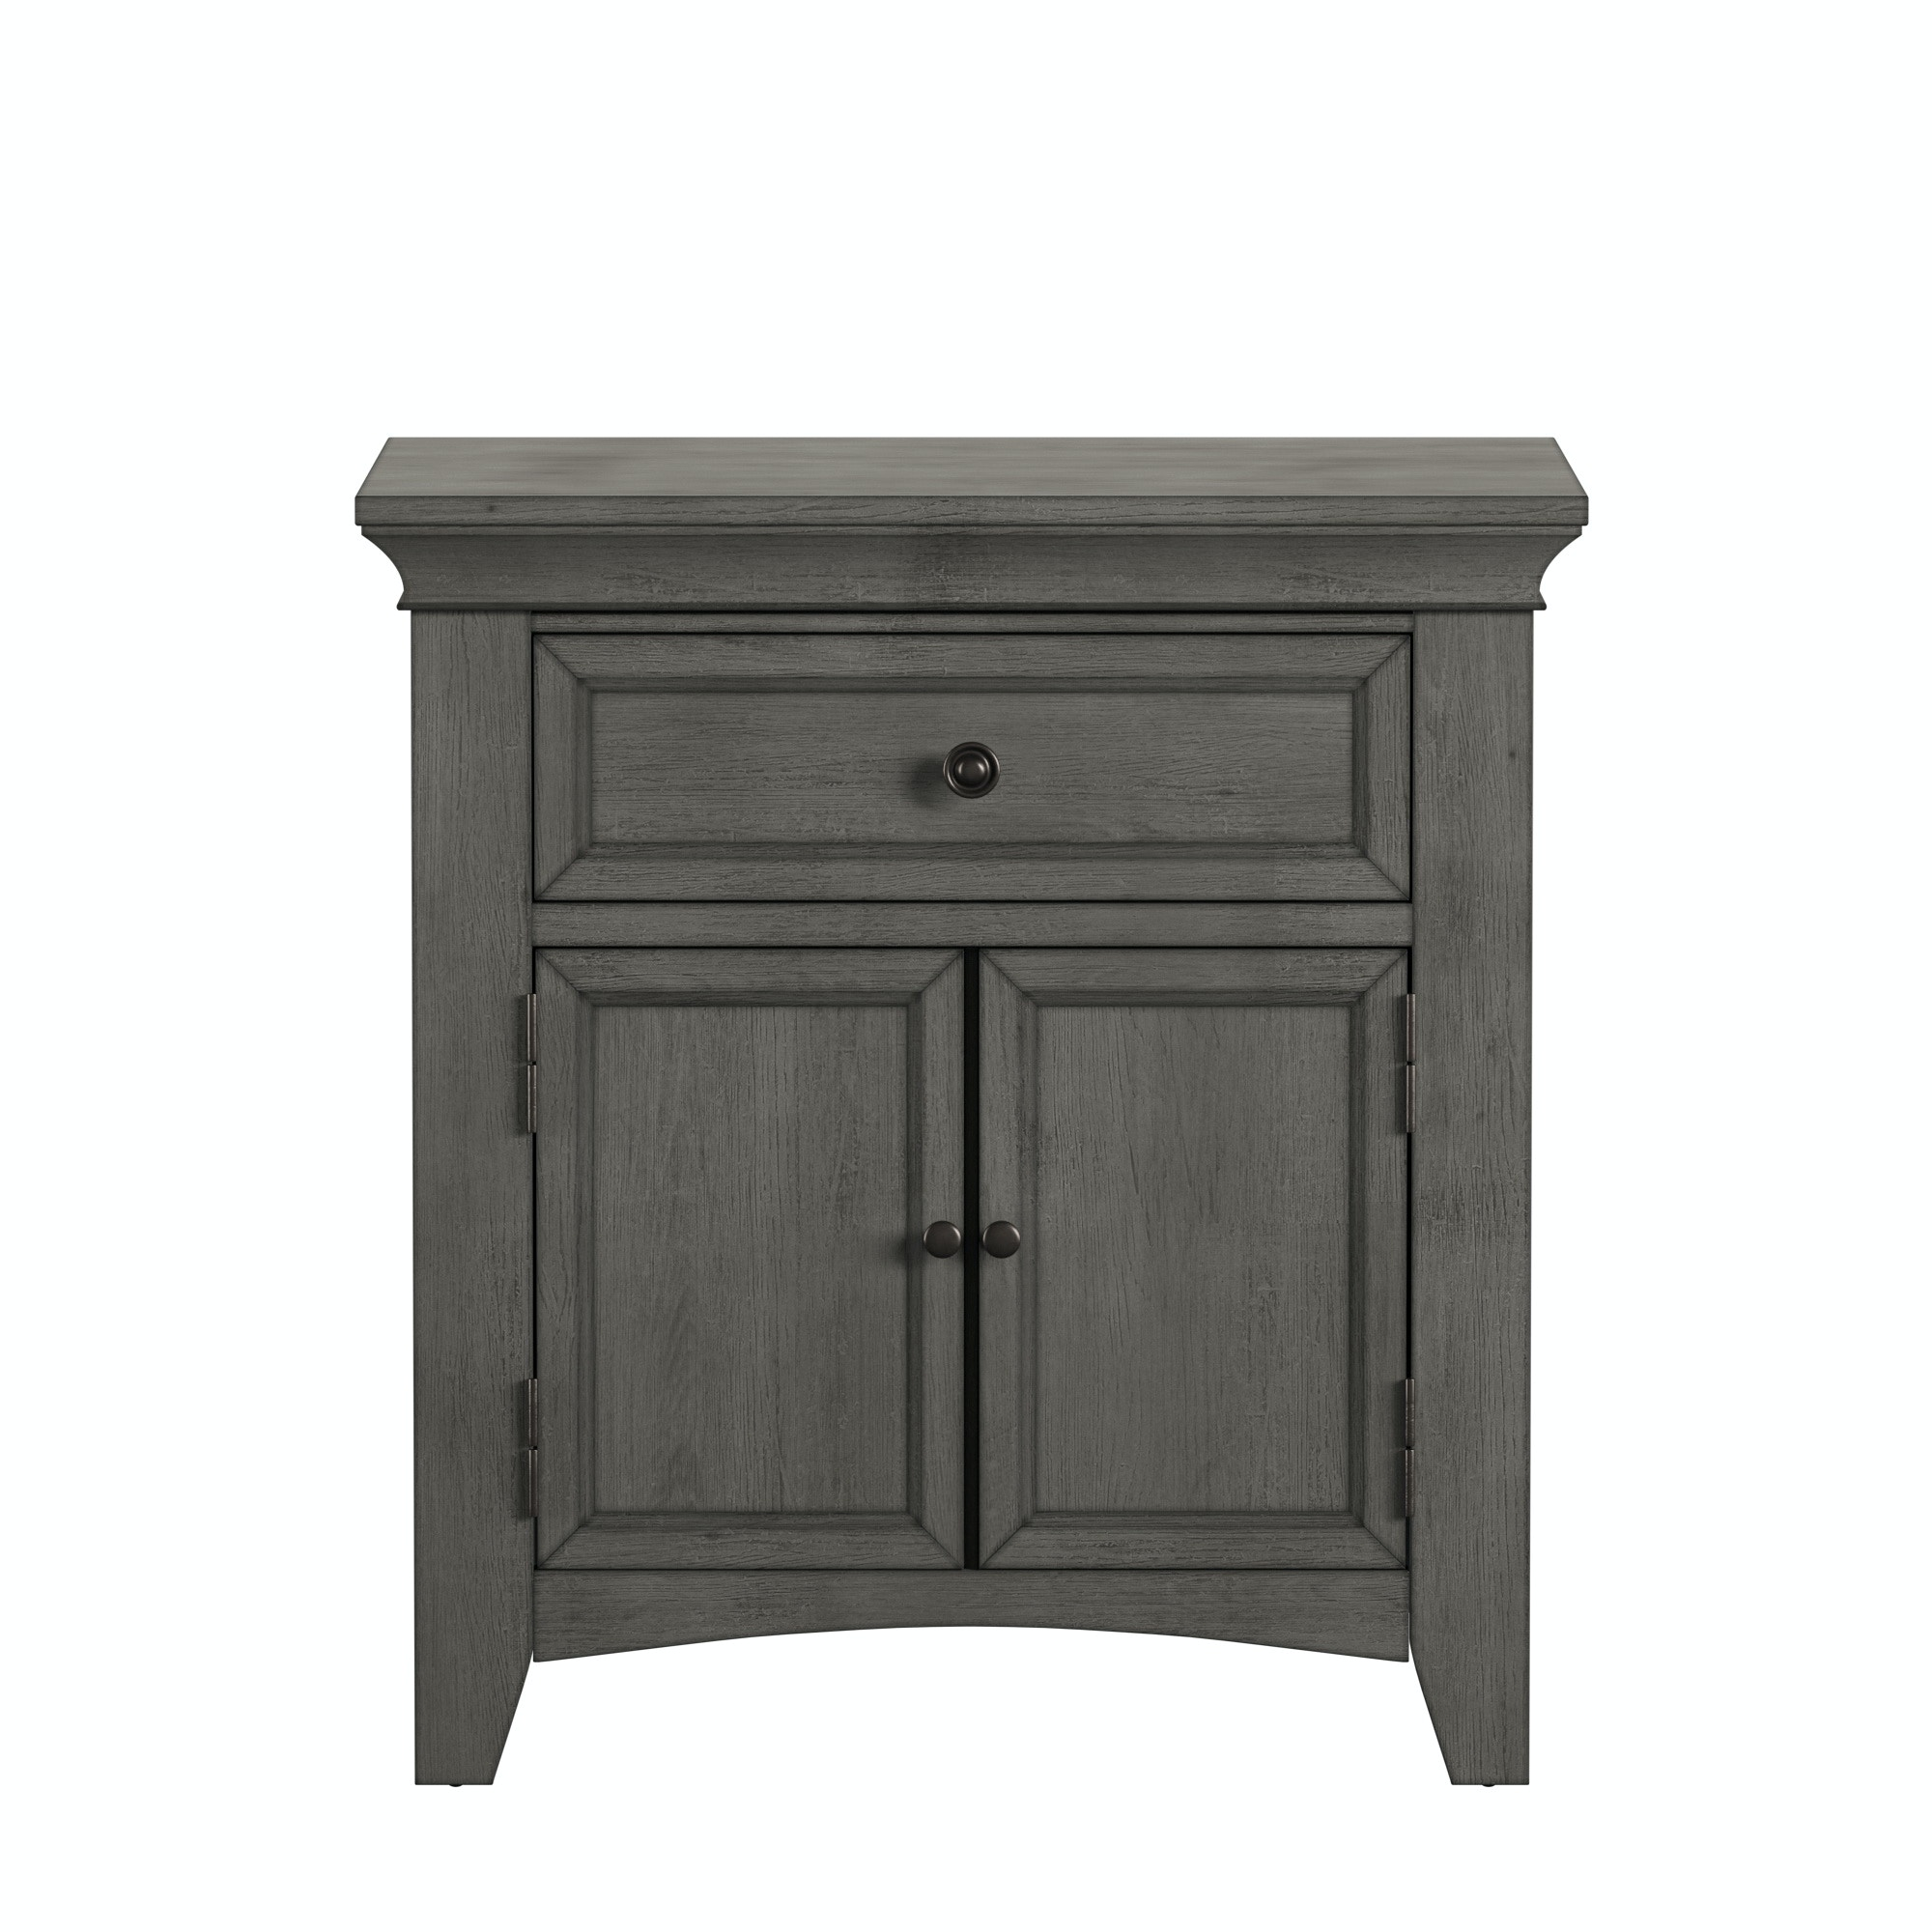 Dearborn Cupboard Nightstand Antique Grey Finish